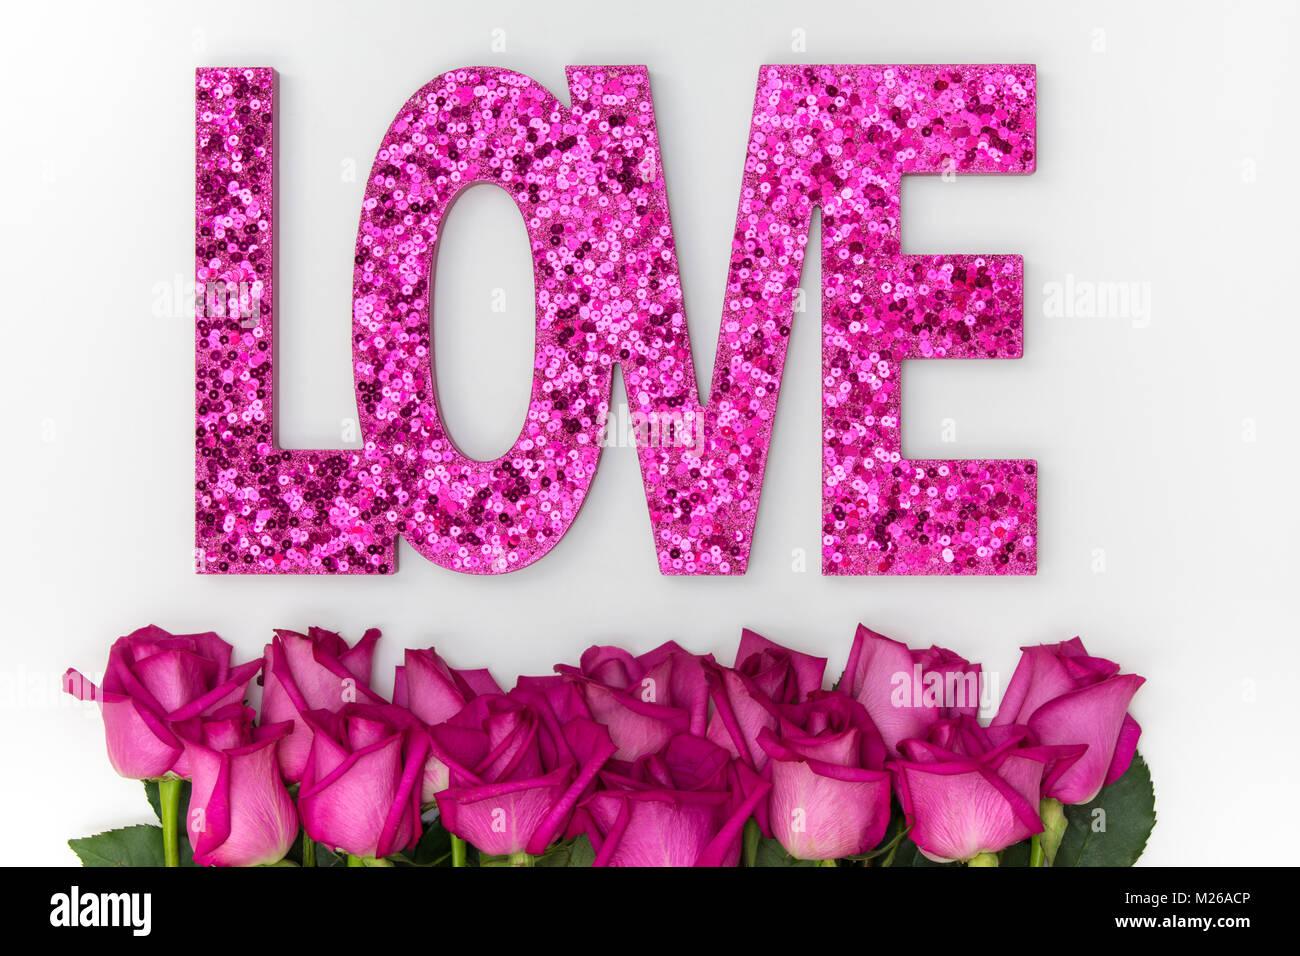 Cupid\u2019s Rose in Hot Pink